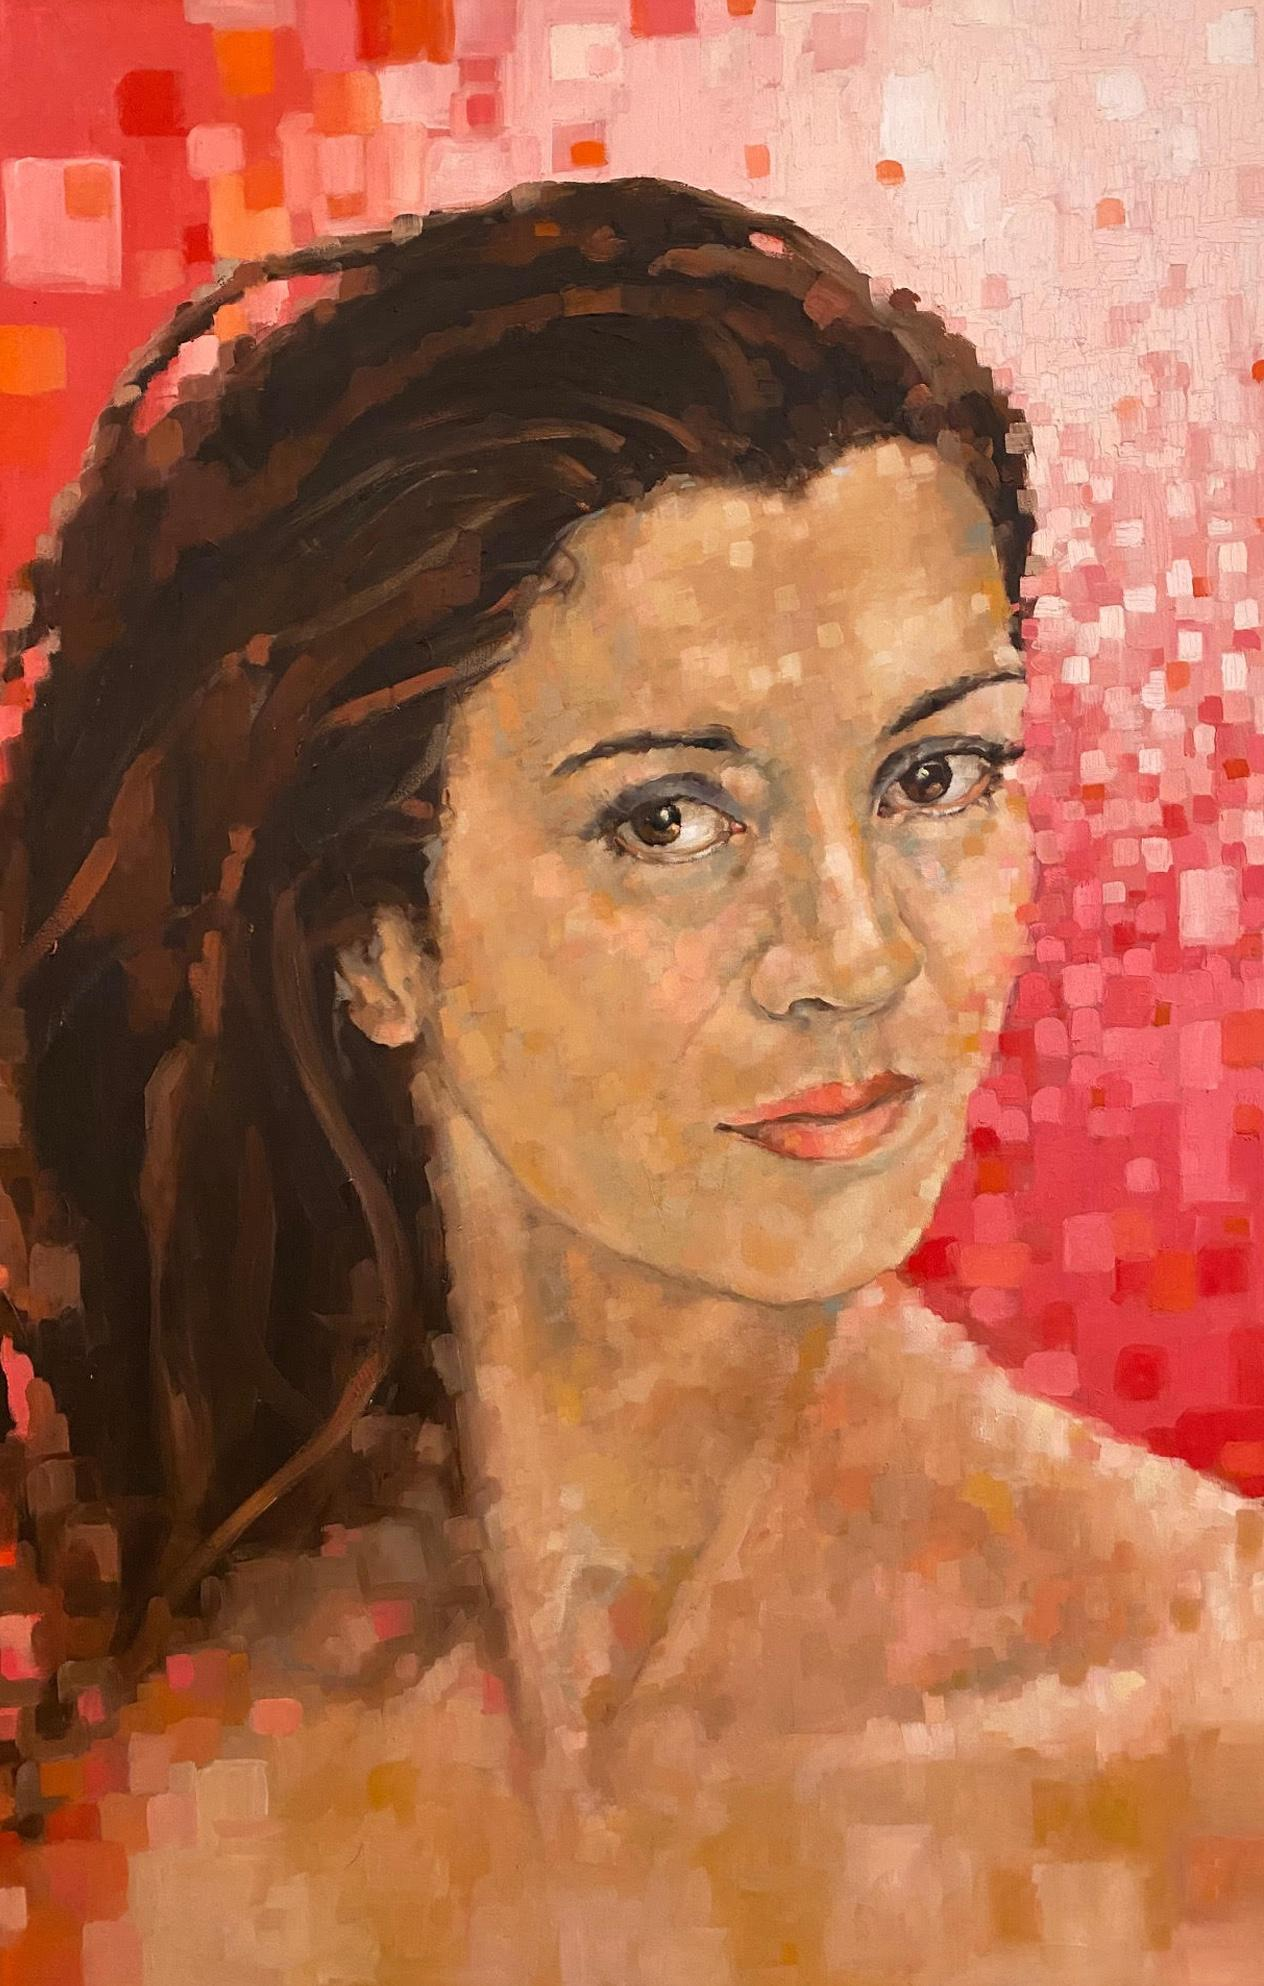 """Dina"" oil on board 34.5"" x 47"" by Shana Wilson"